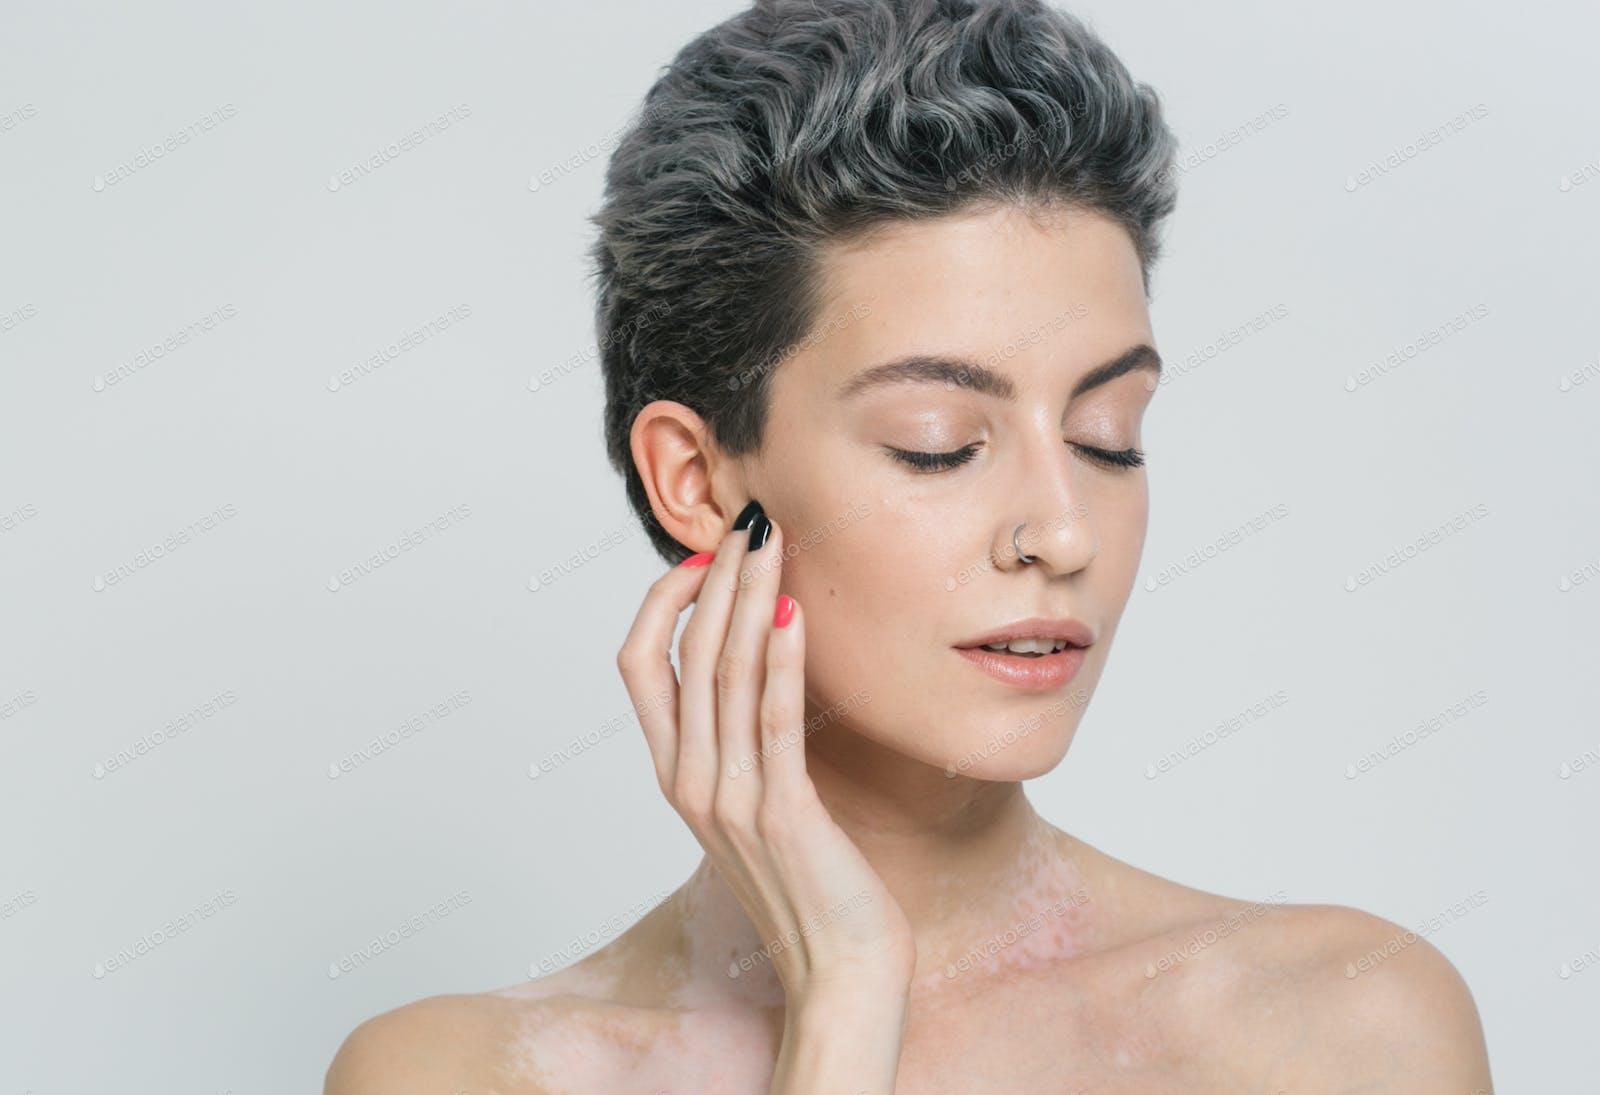 Vitiligo White Woman Beauty Portrait Photo By Kiraliffe On Envato Elements